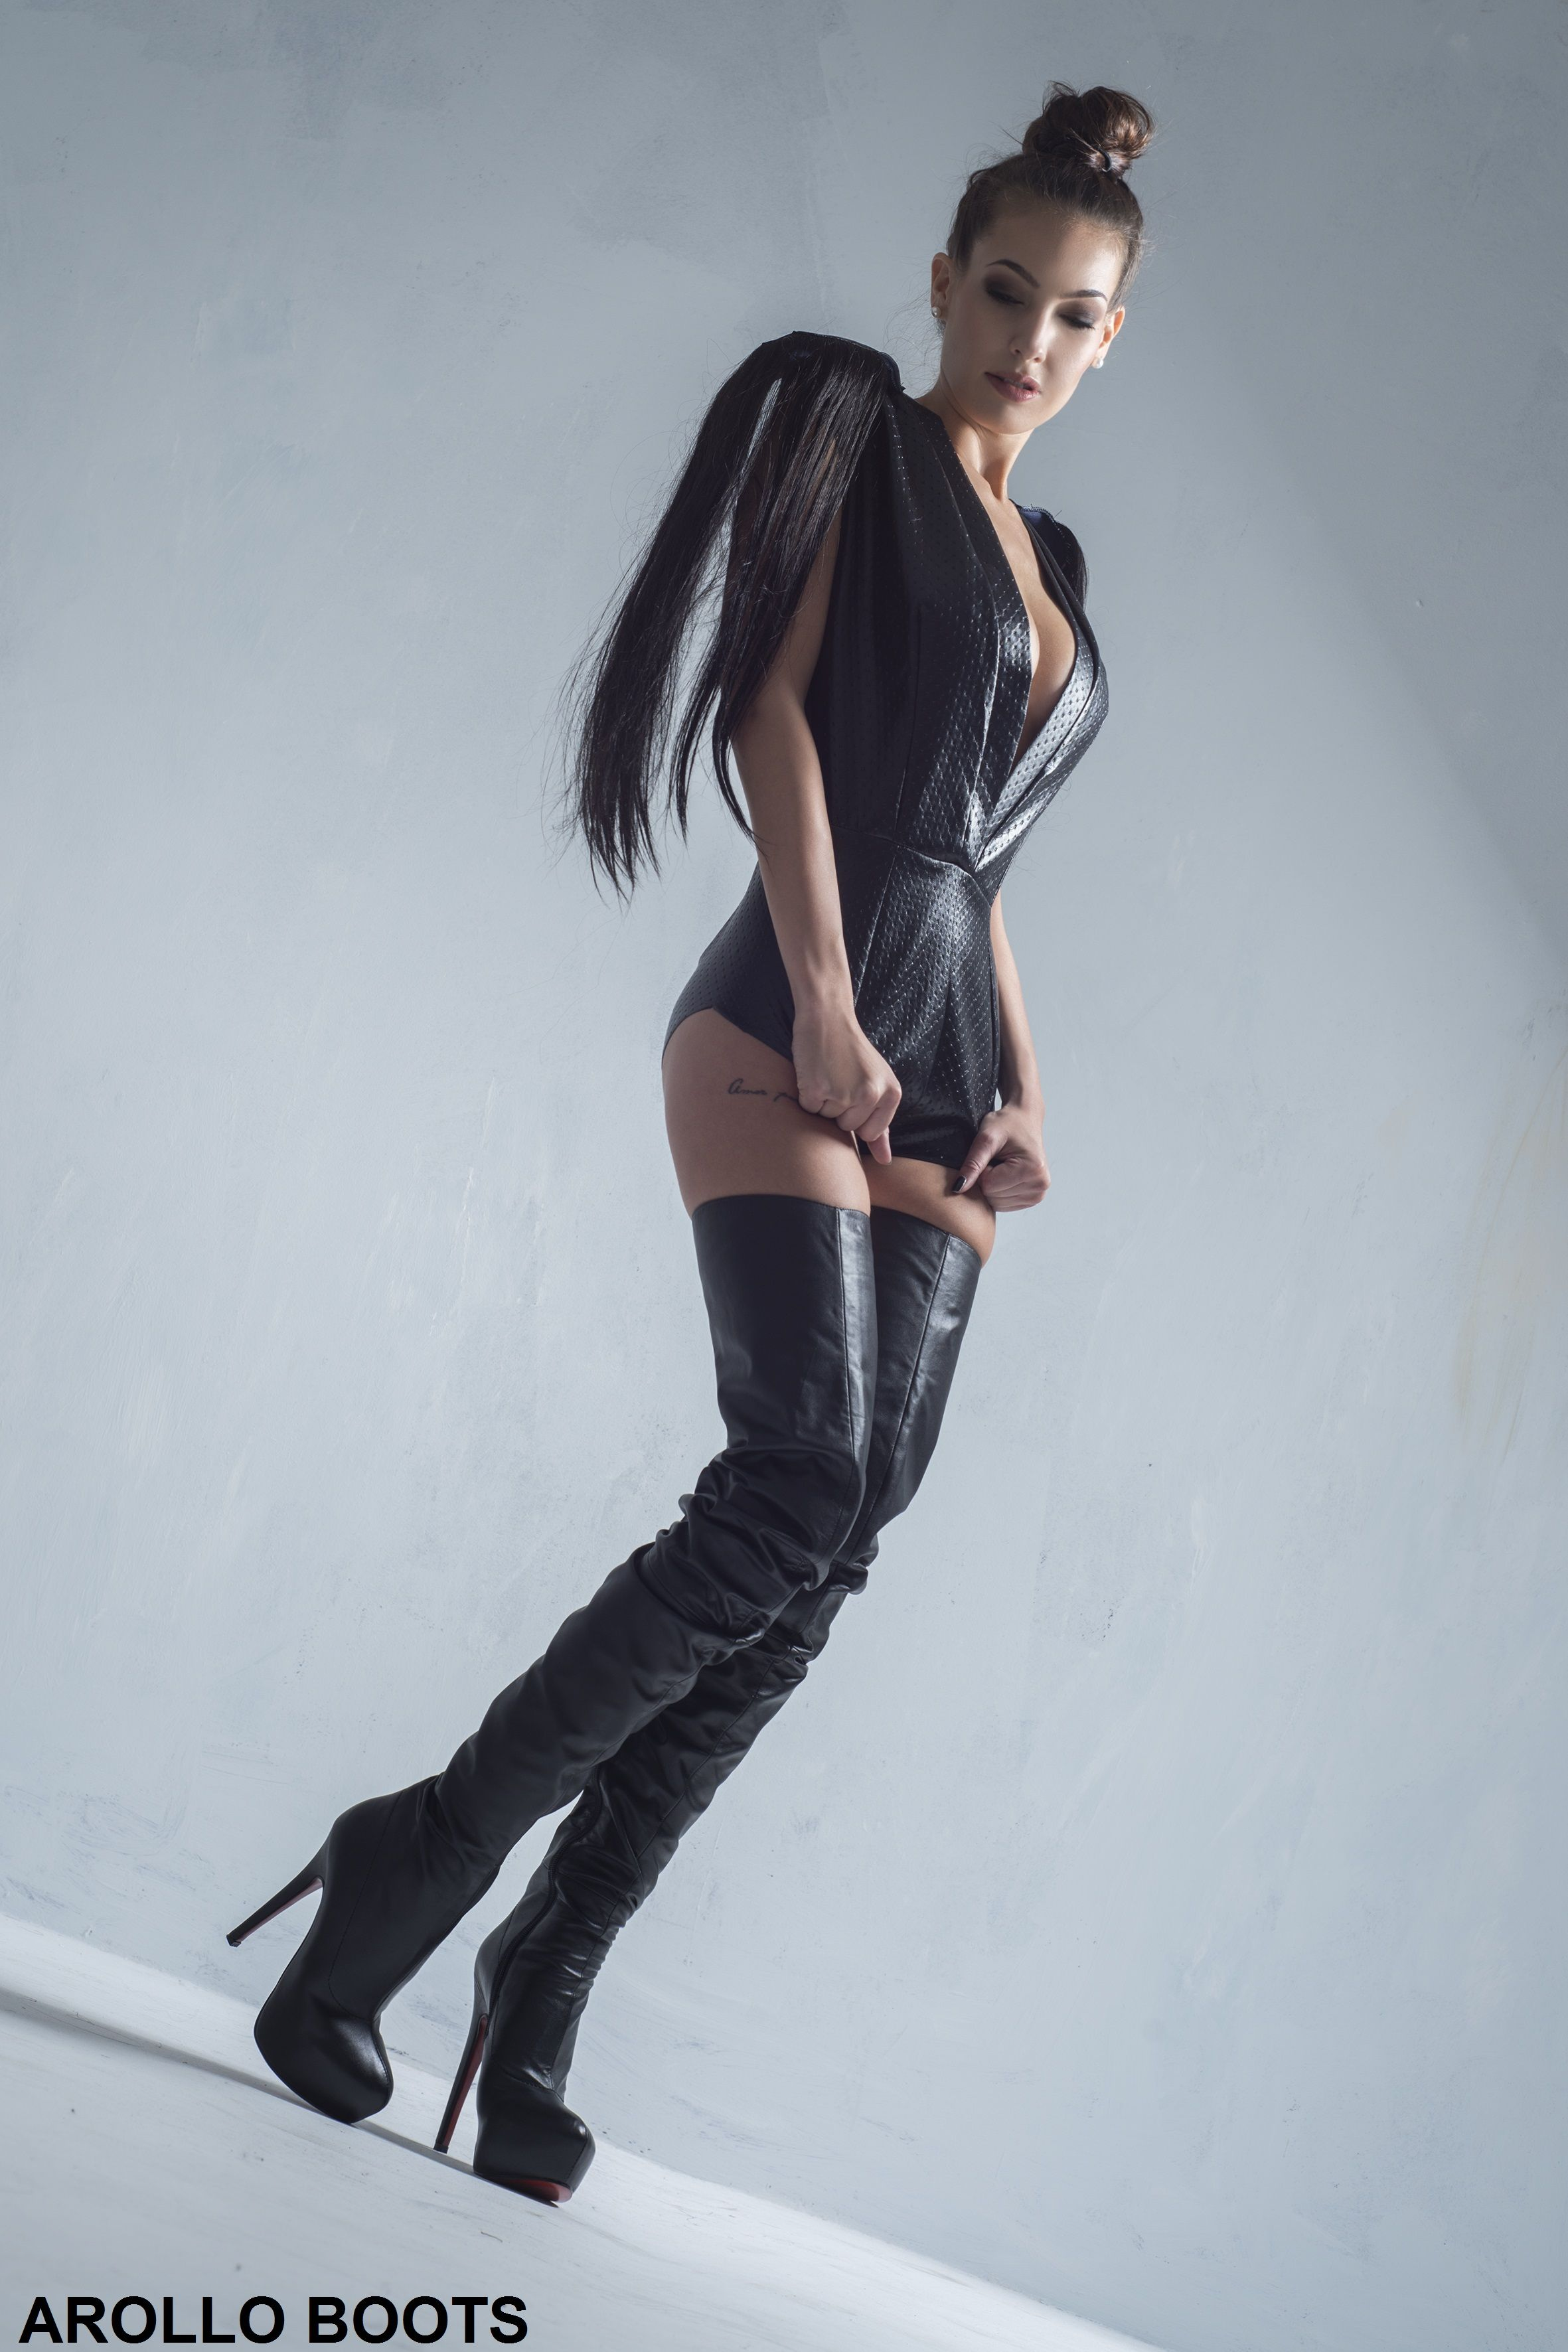 Arollo Leather Heeled Boots 692b674f9ddb7ce45c0573f26c25c618